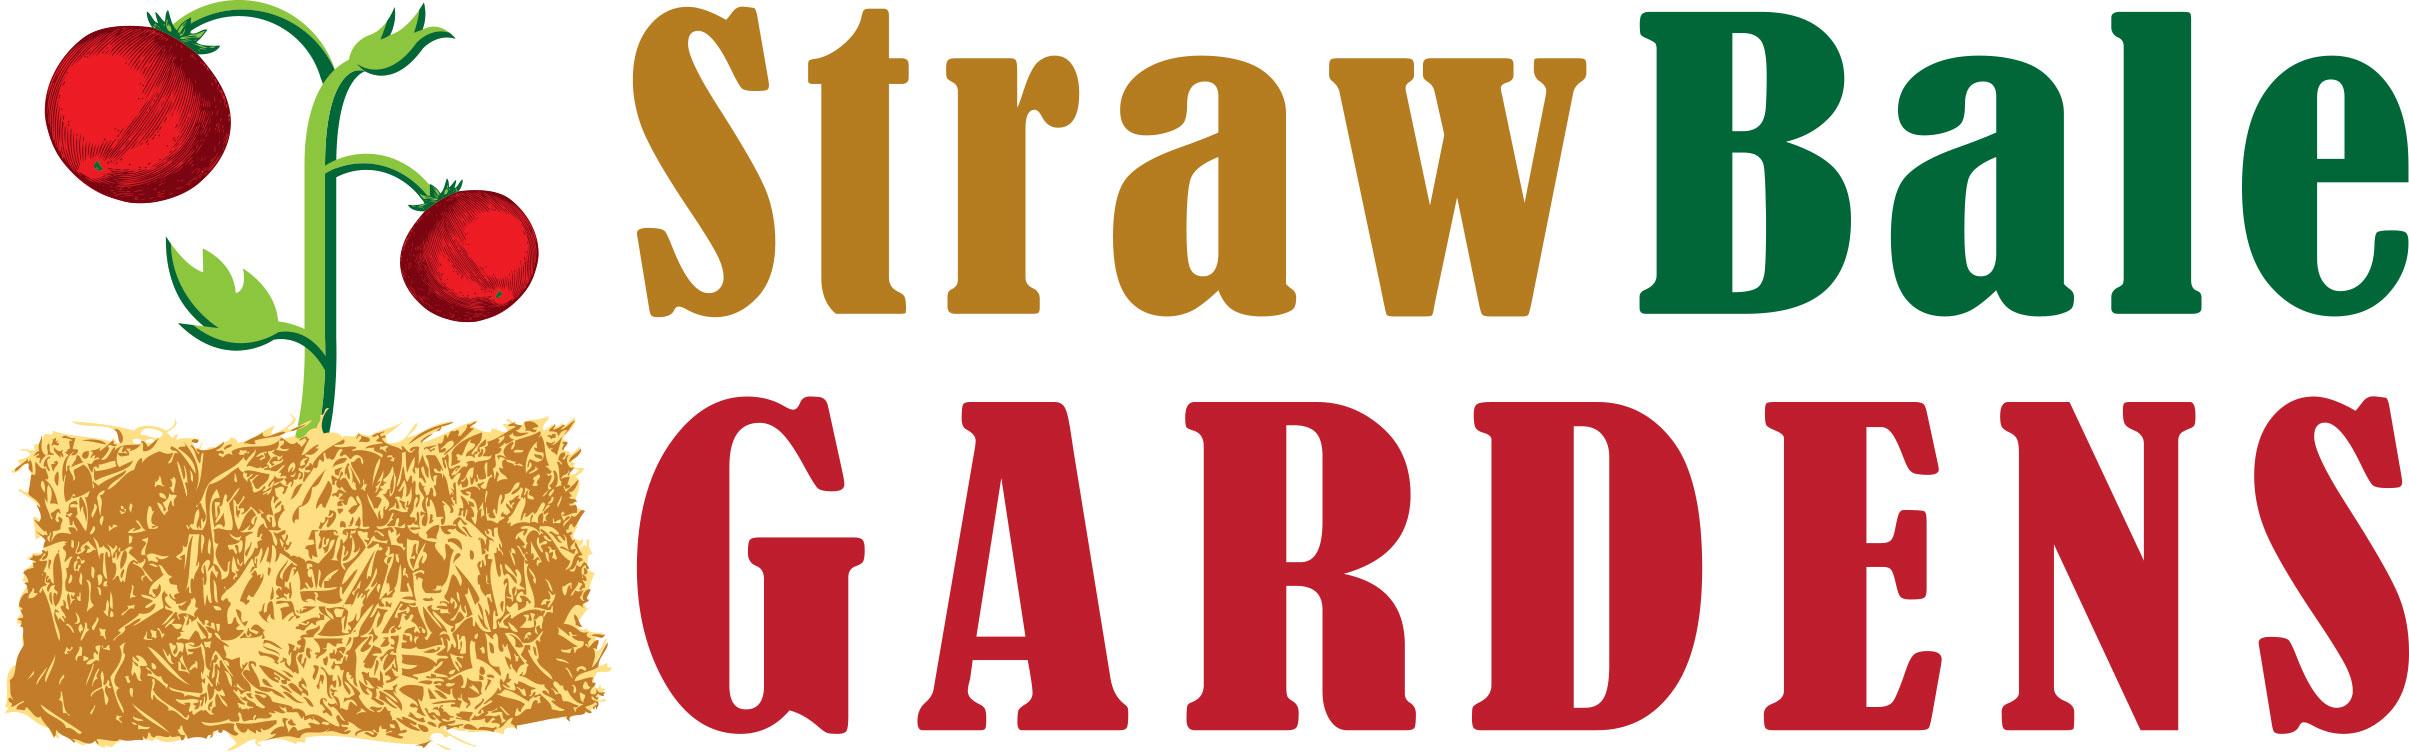 organic straw bale gardening instructions